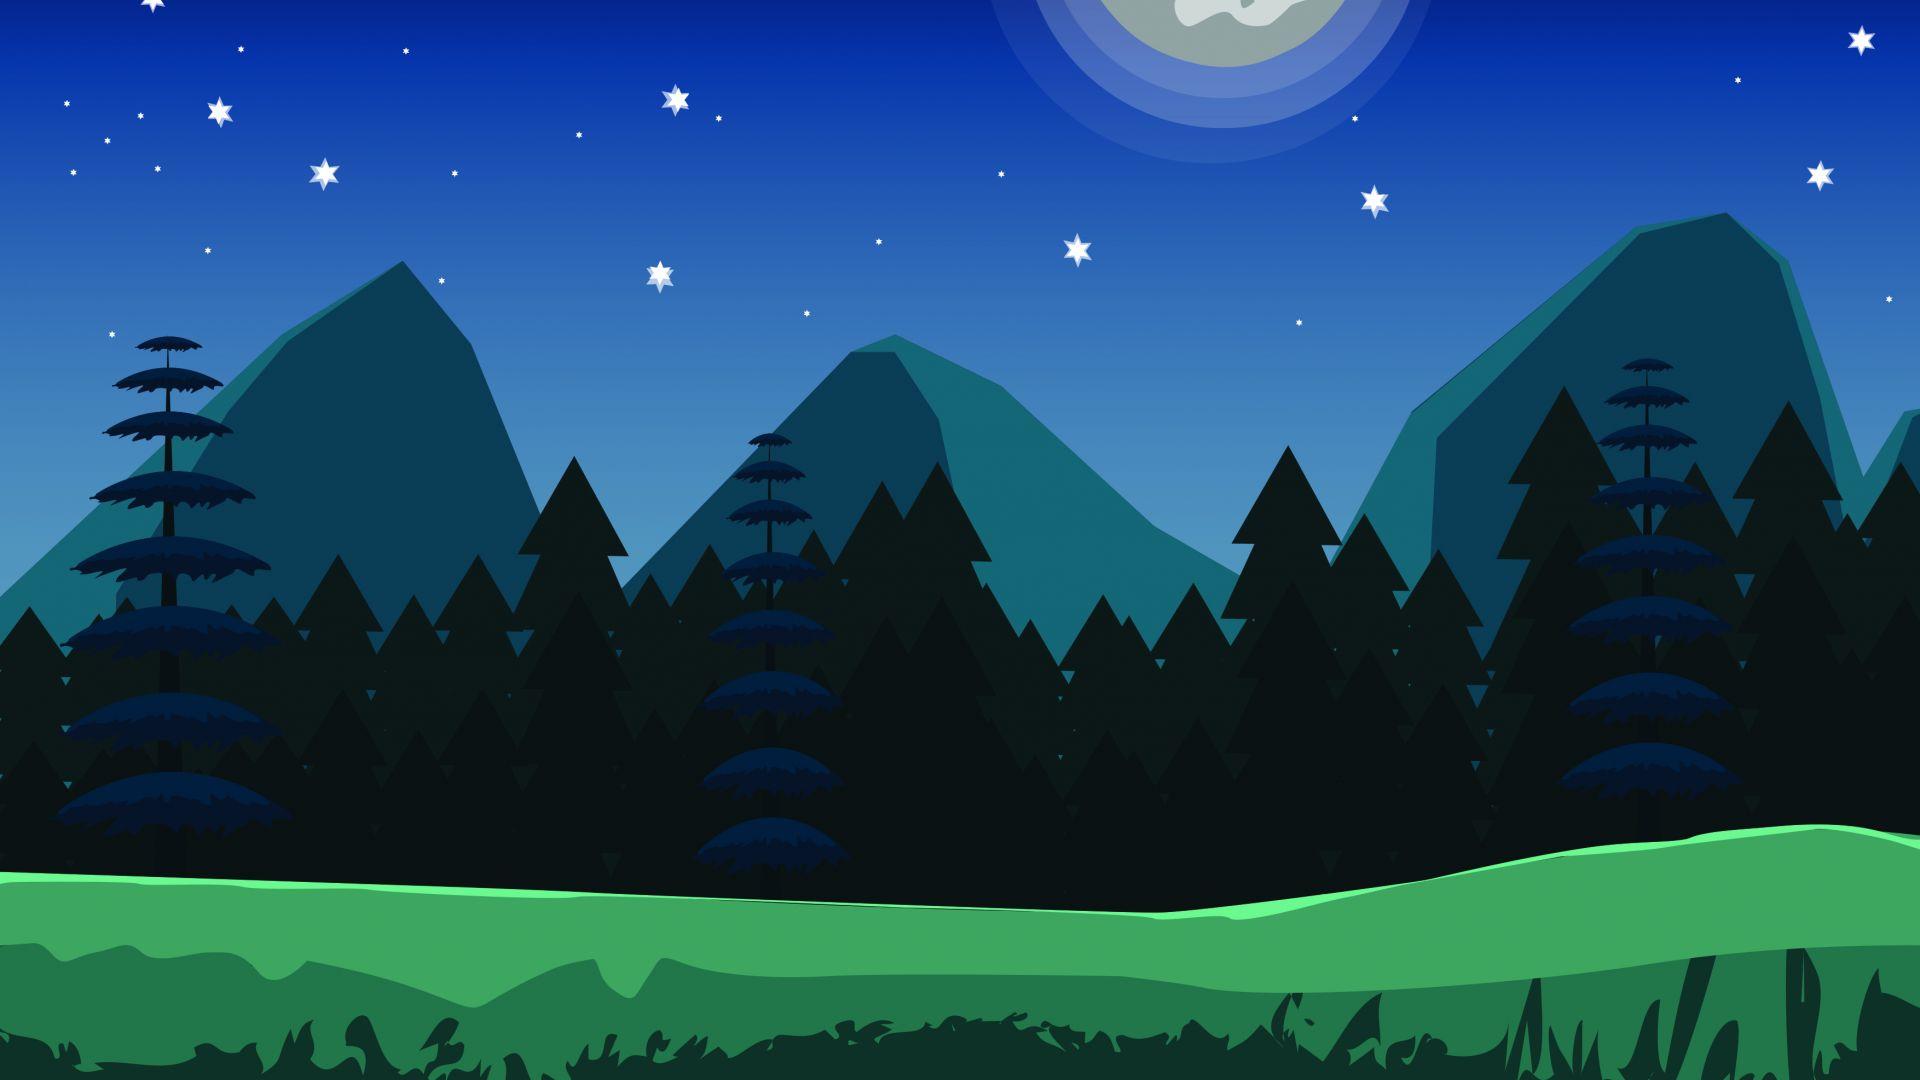 digital art mountains trees 4k